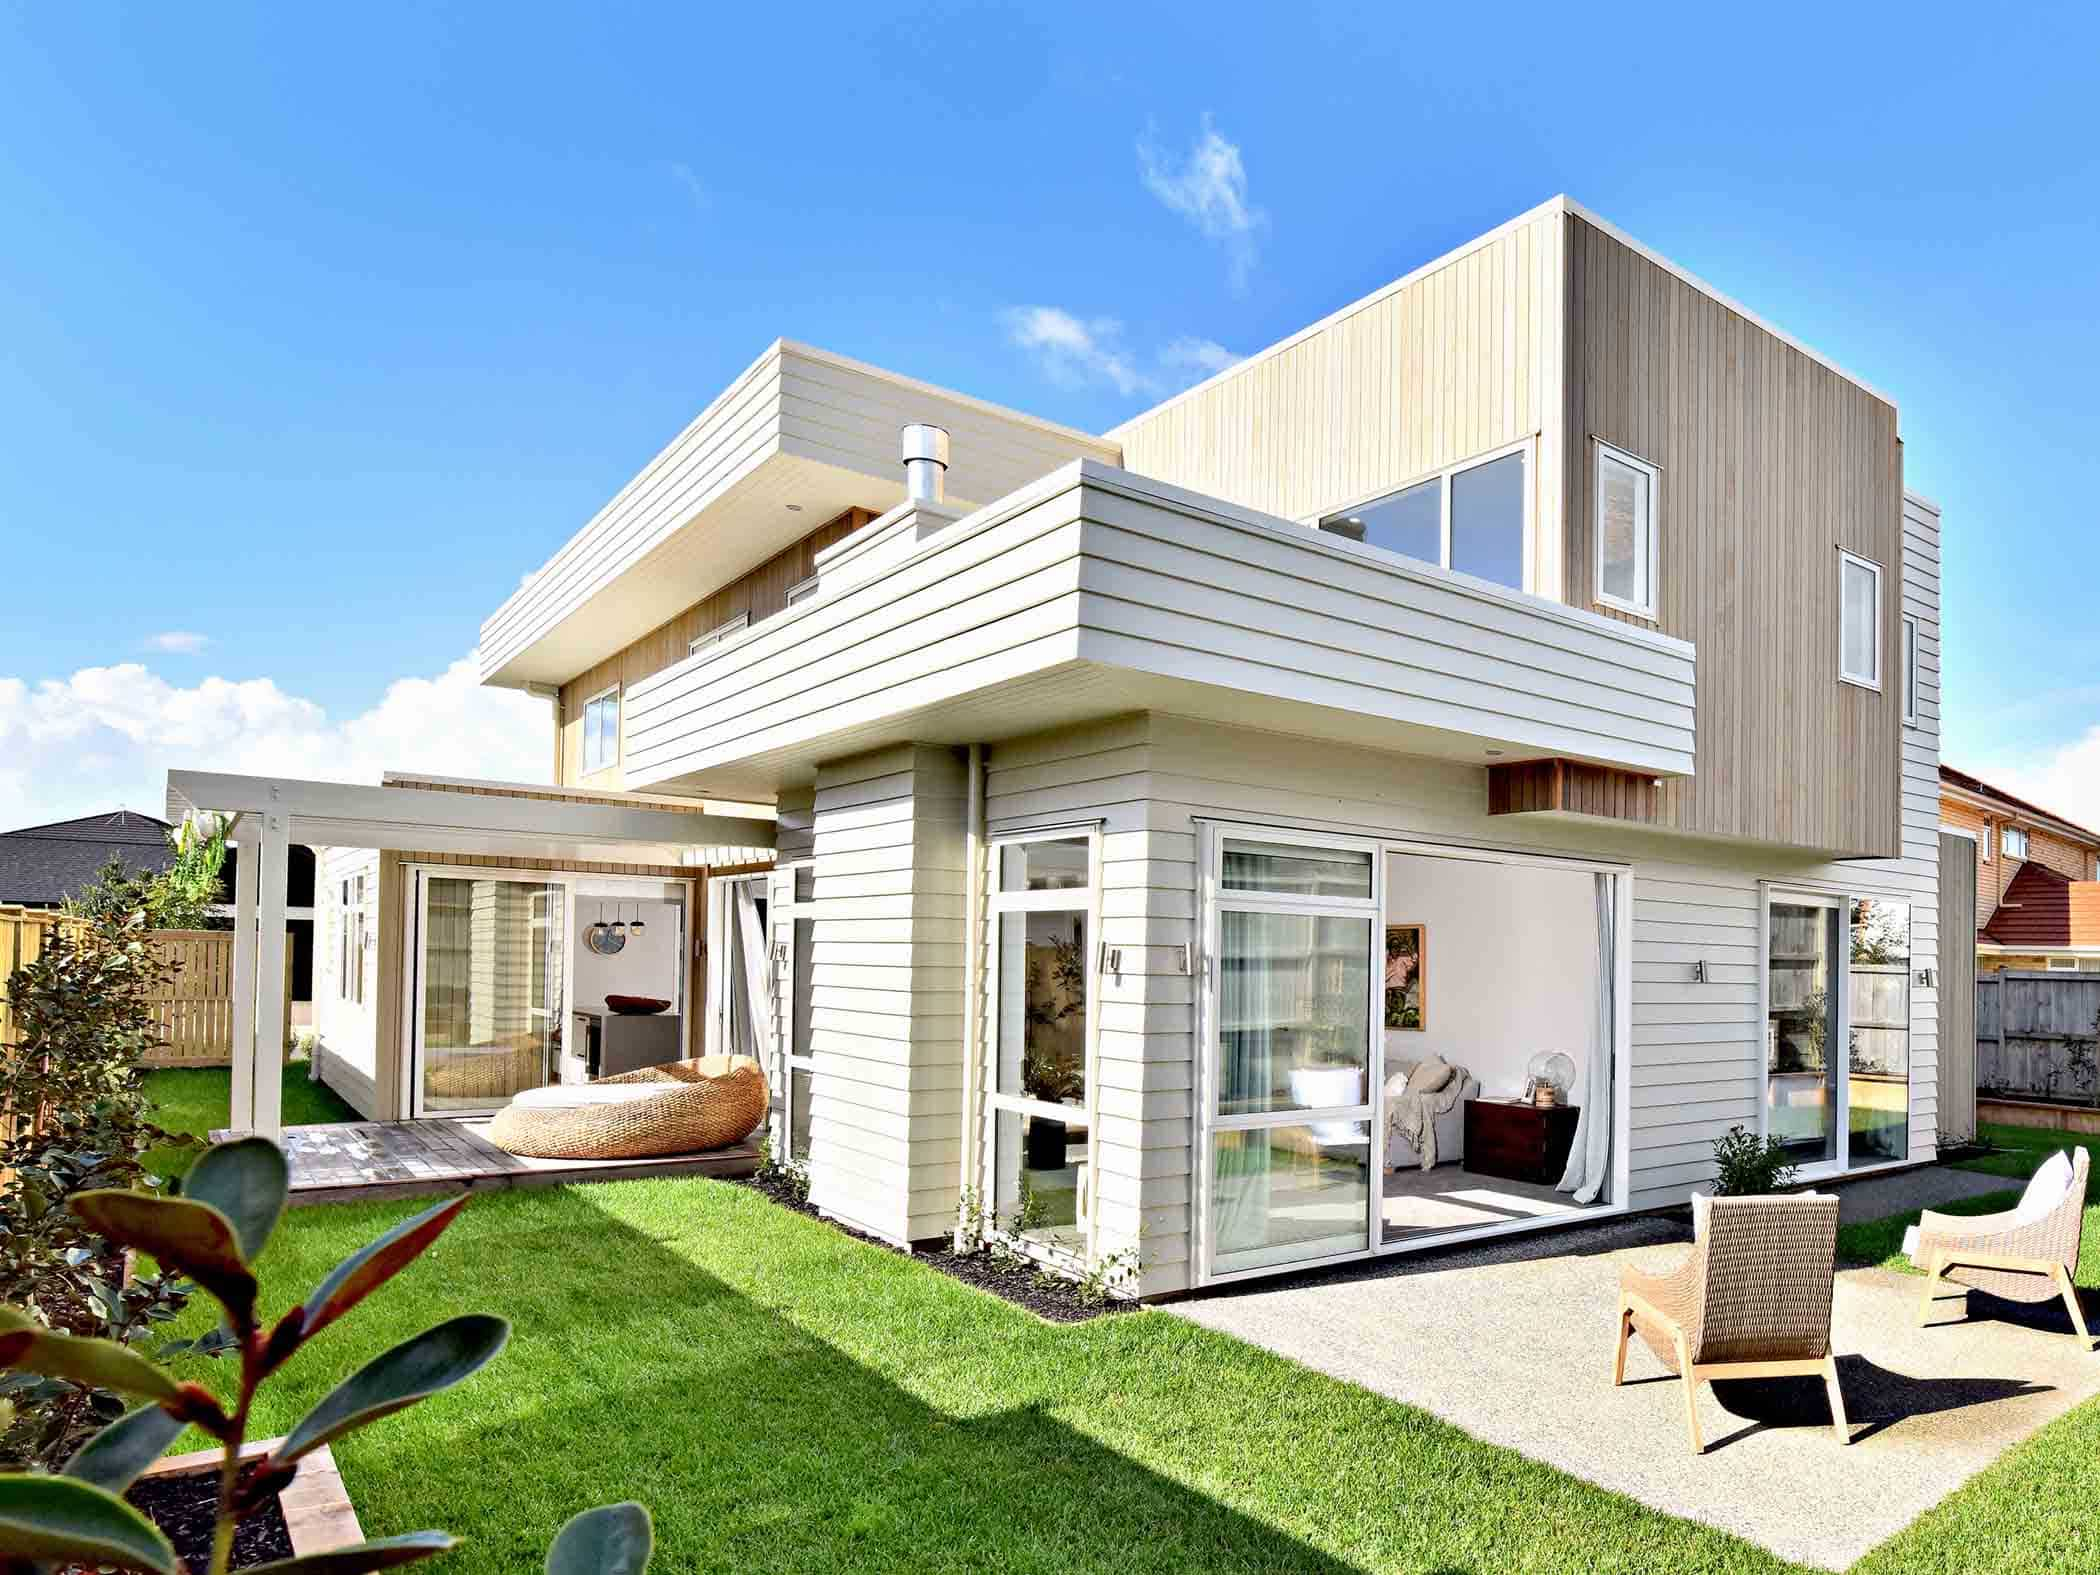 Rumah Modern Minimalis 2 Lantai Bergaya Eropa Thegorbalsla